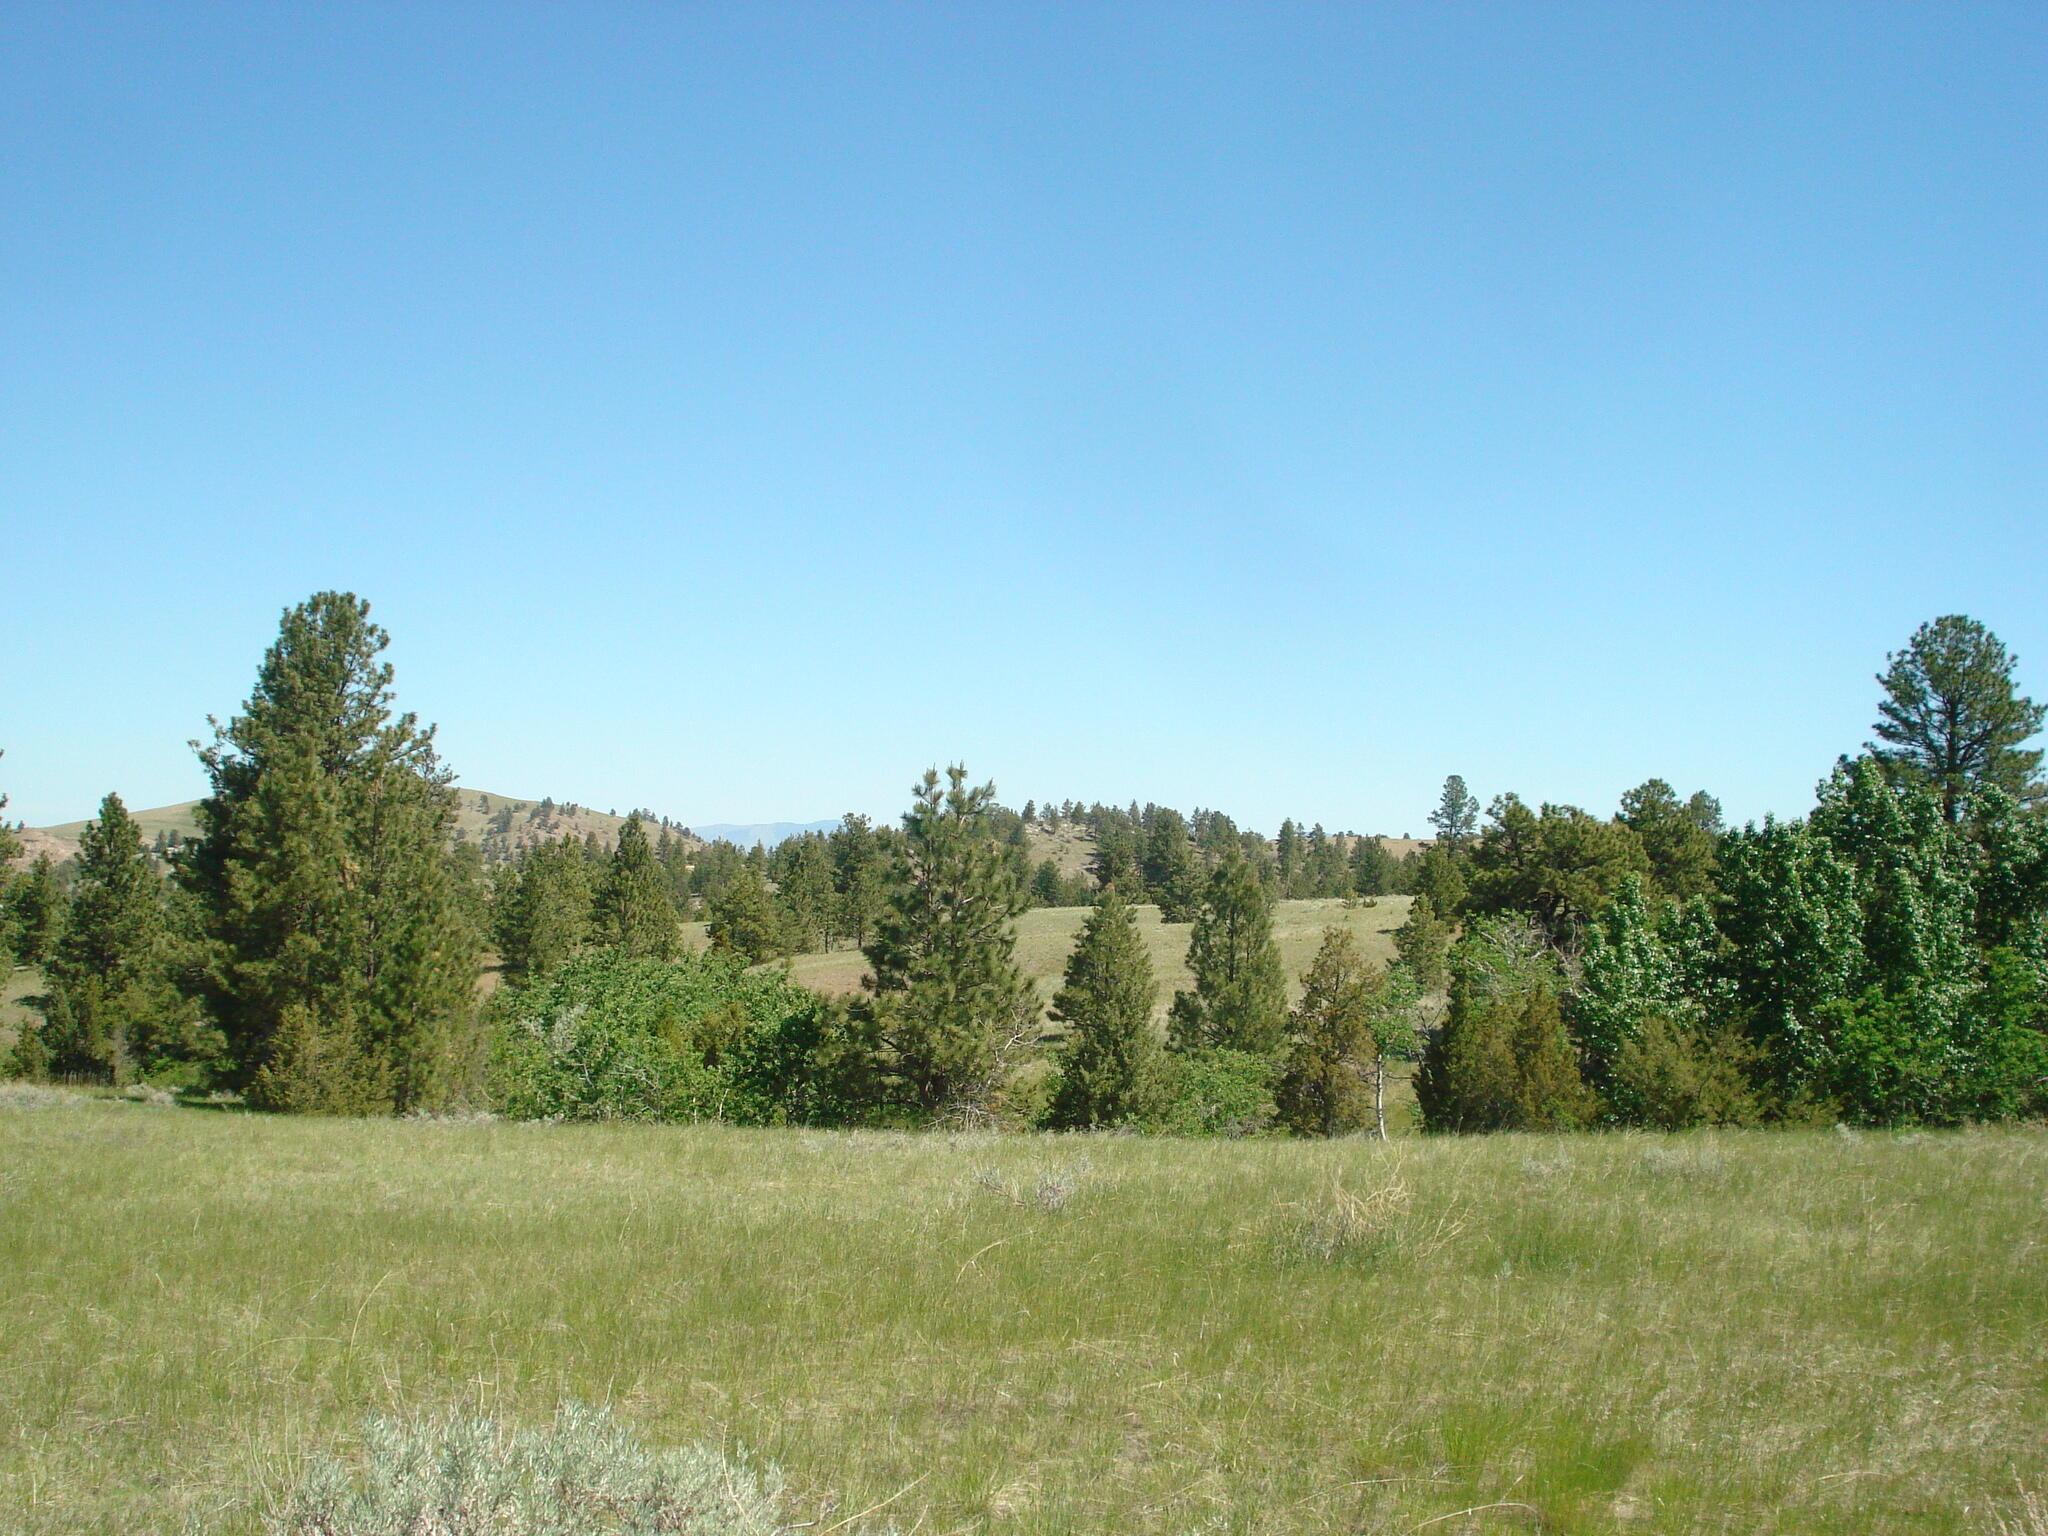 Tbd West Sawmill Road, Montana City, MT 59634